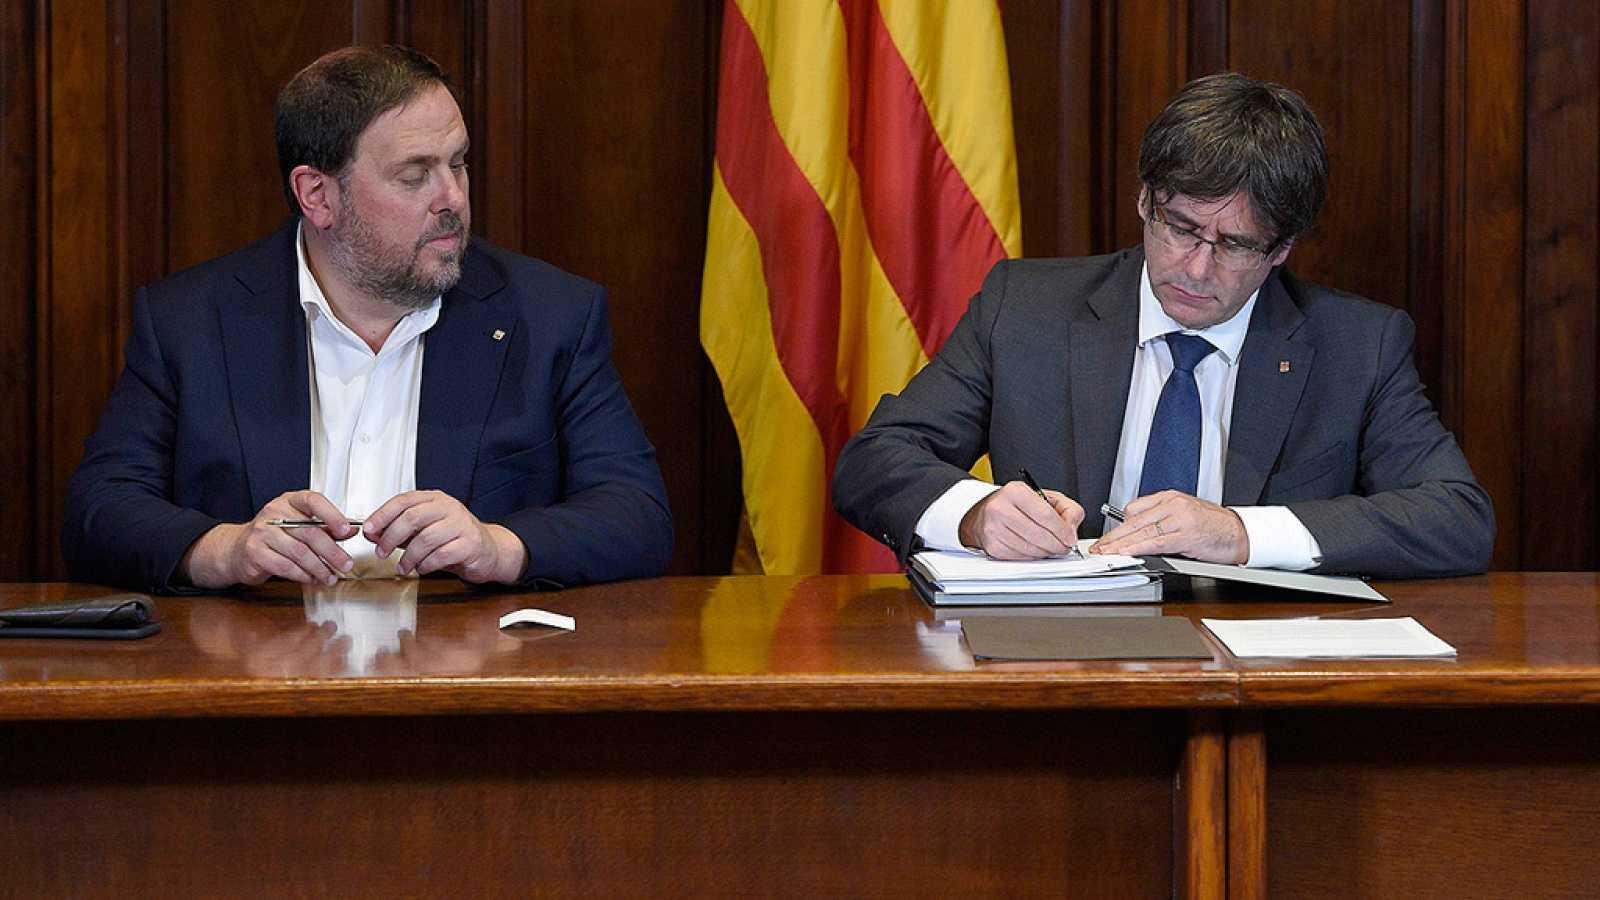 Puigdemont llama a los catalanes a votar el 1-O tras convocar el referéndum soberanista